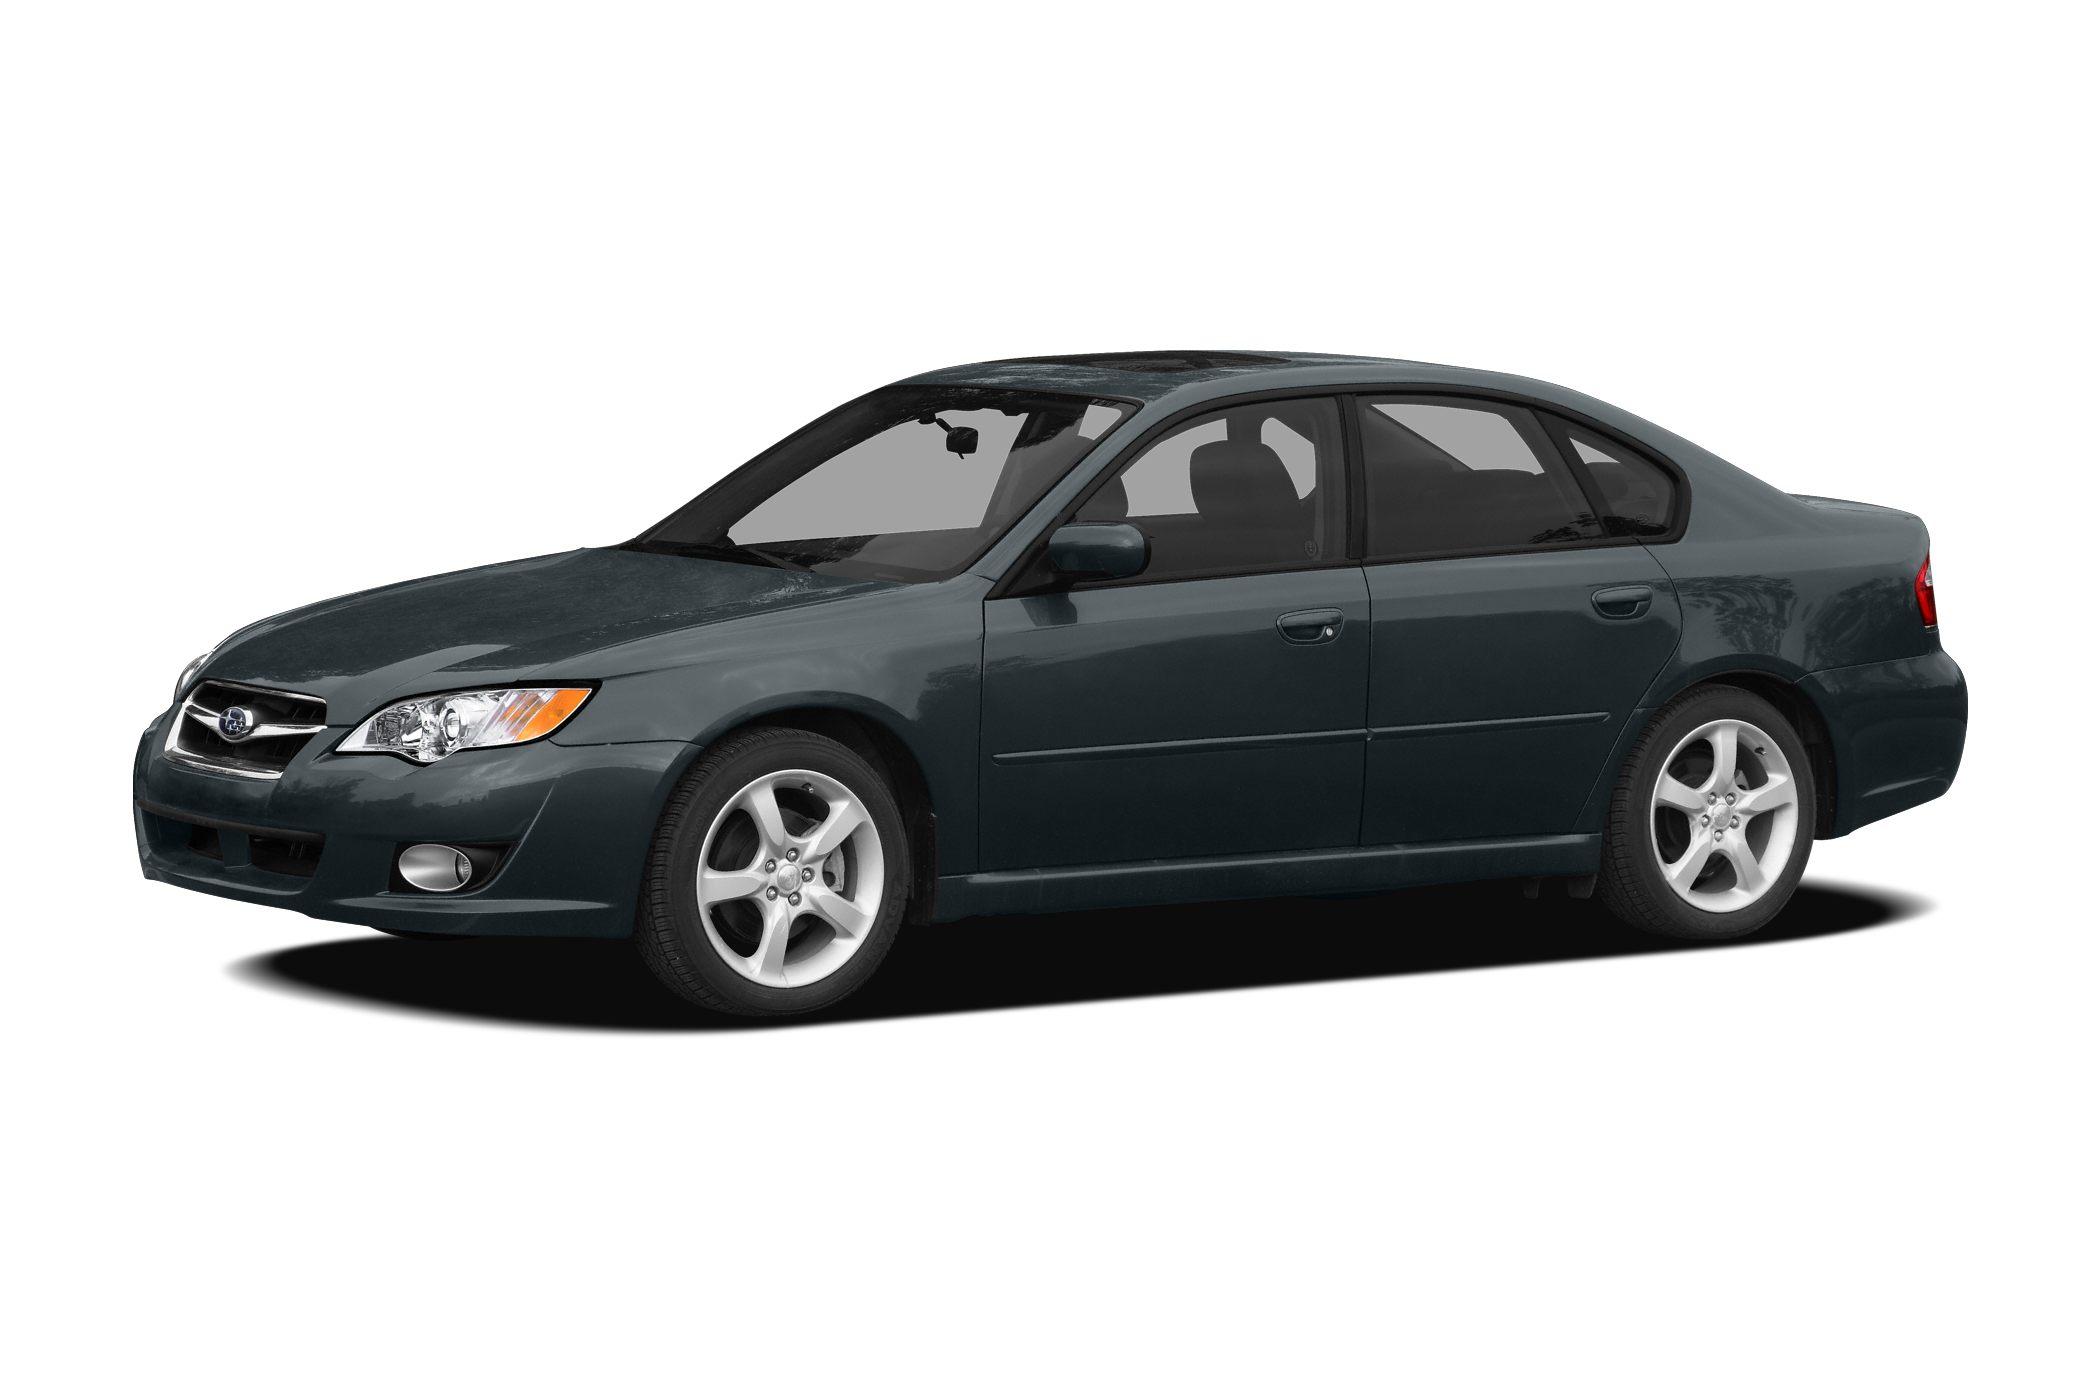 Subaru Legacy: Tire pressures and wear